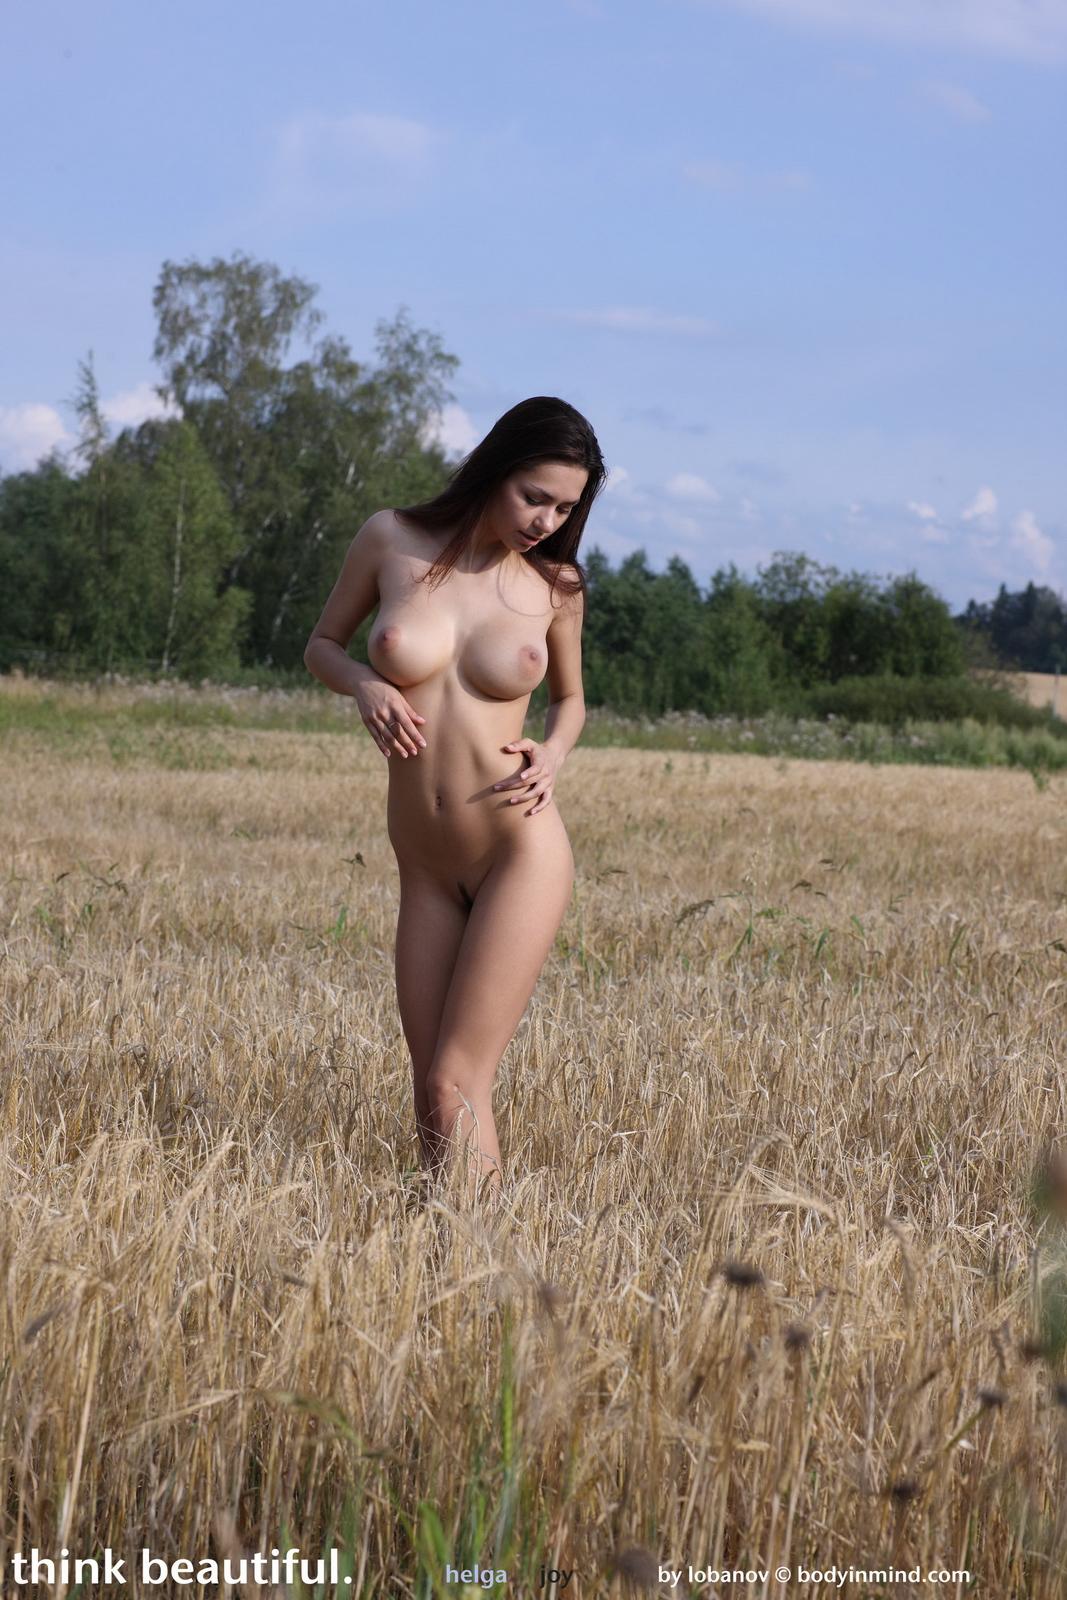 helga-boobs-nude-field-grain-bodyinmind-27